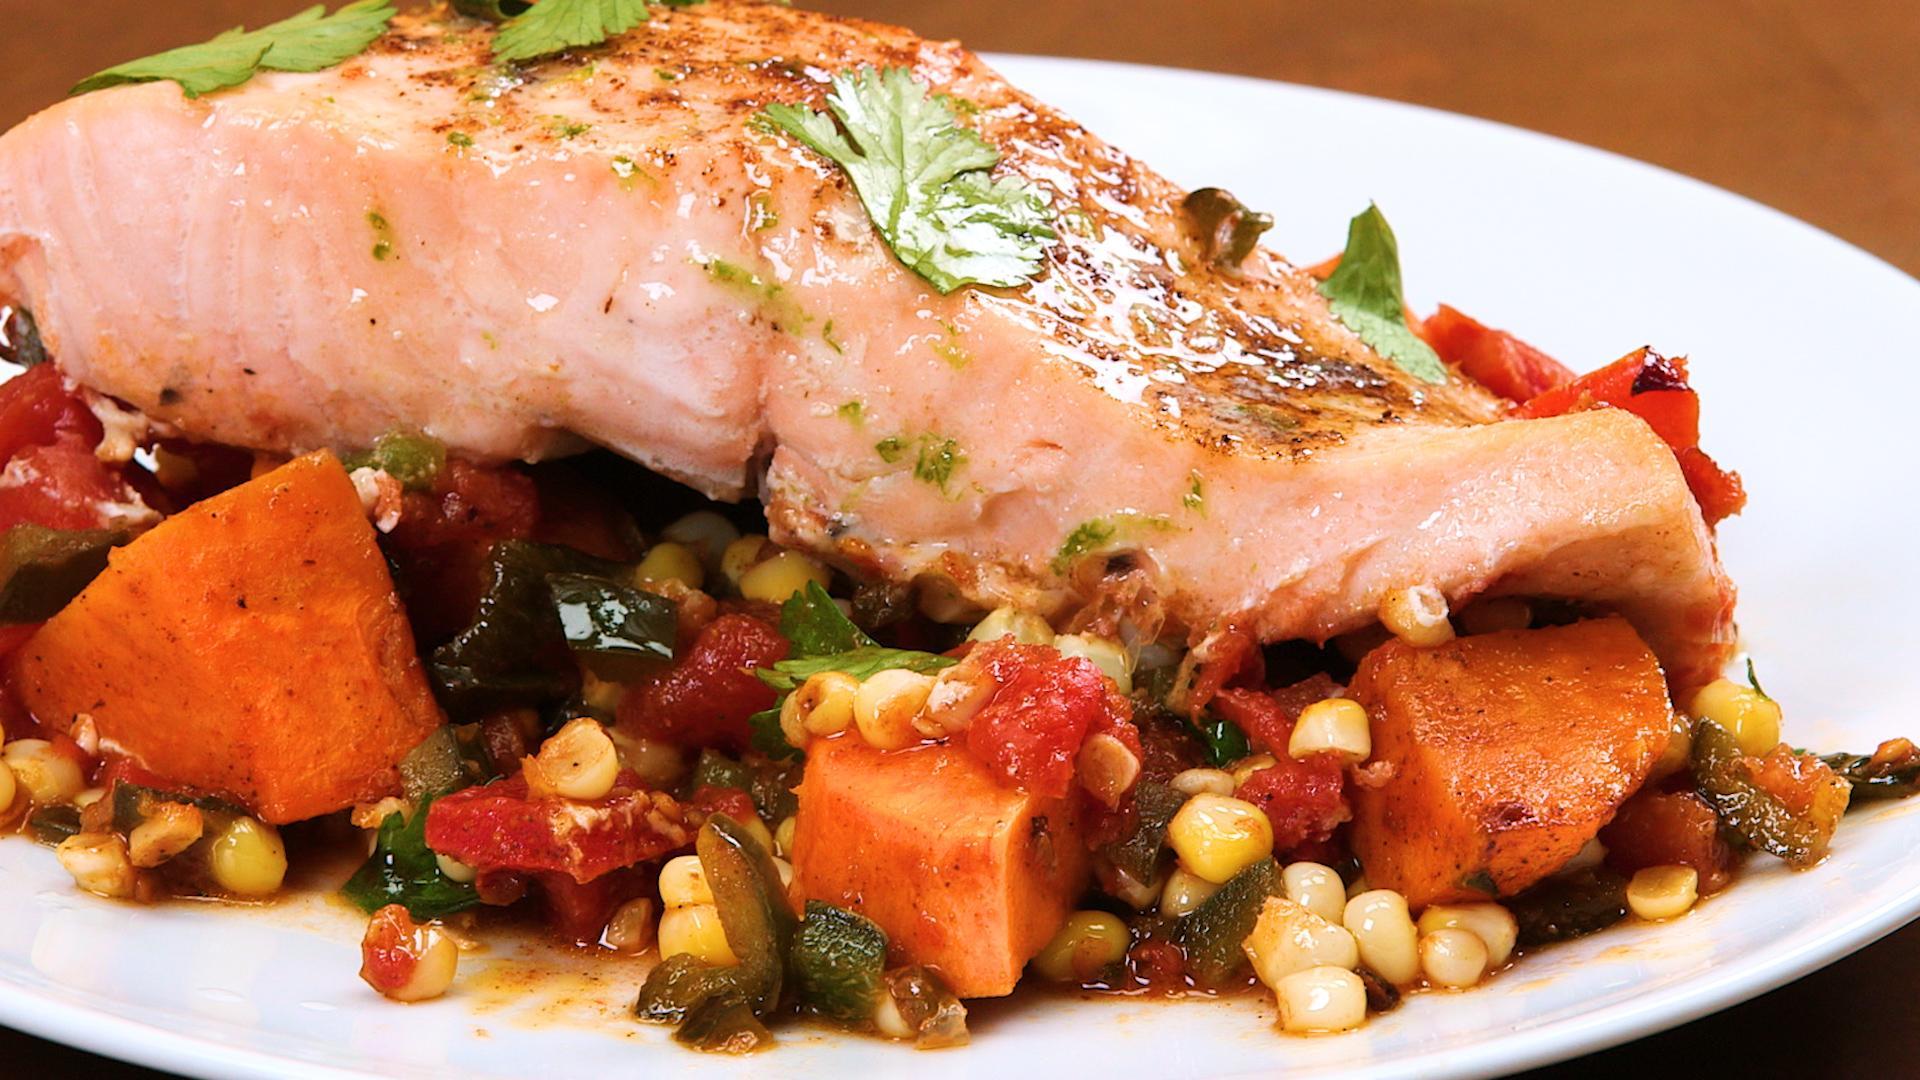 Southwestern Salmon Skillet Supper